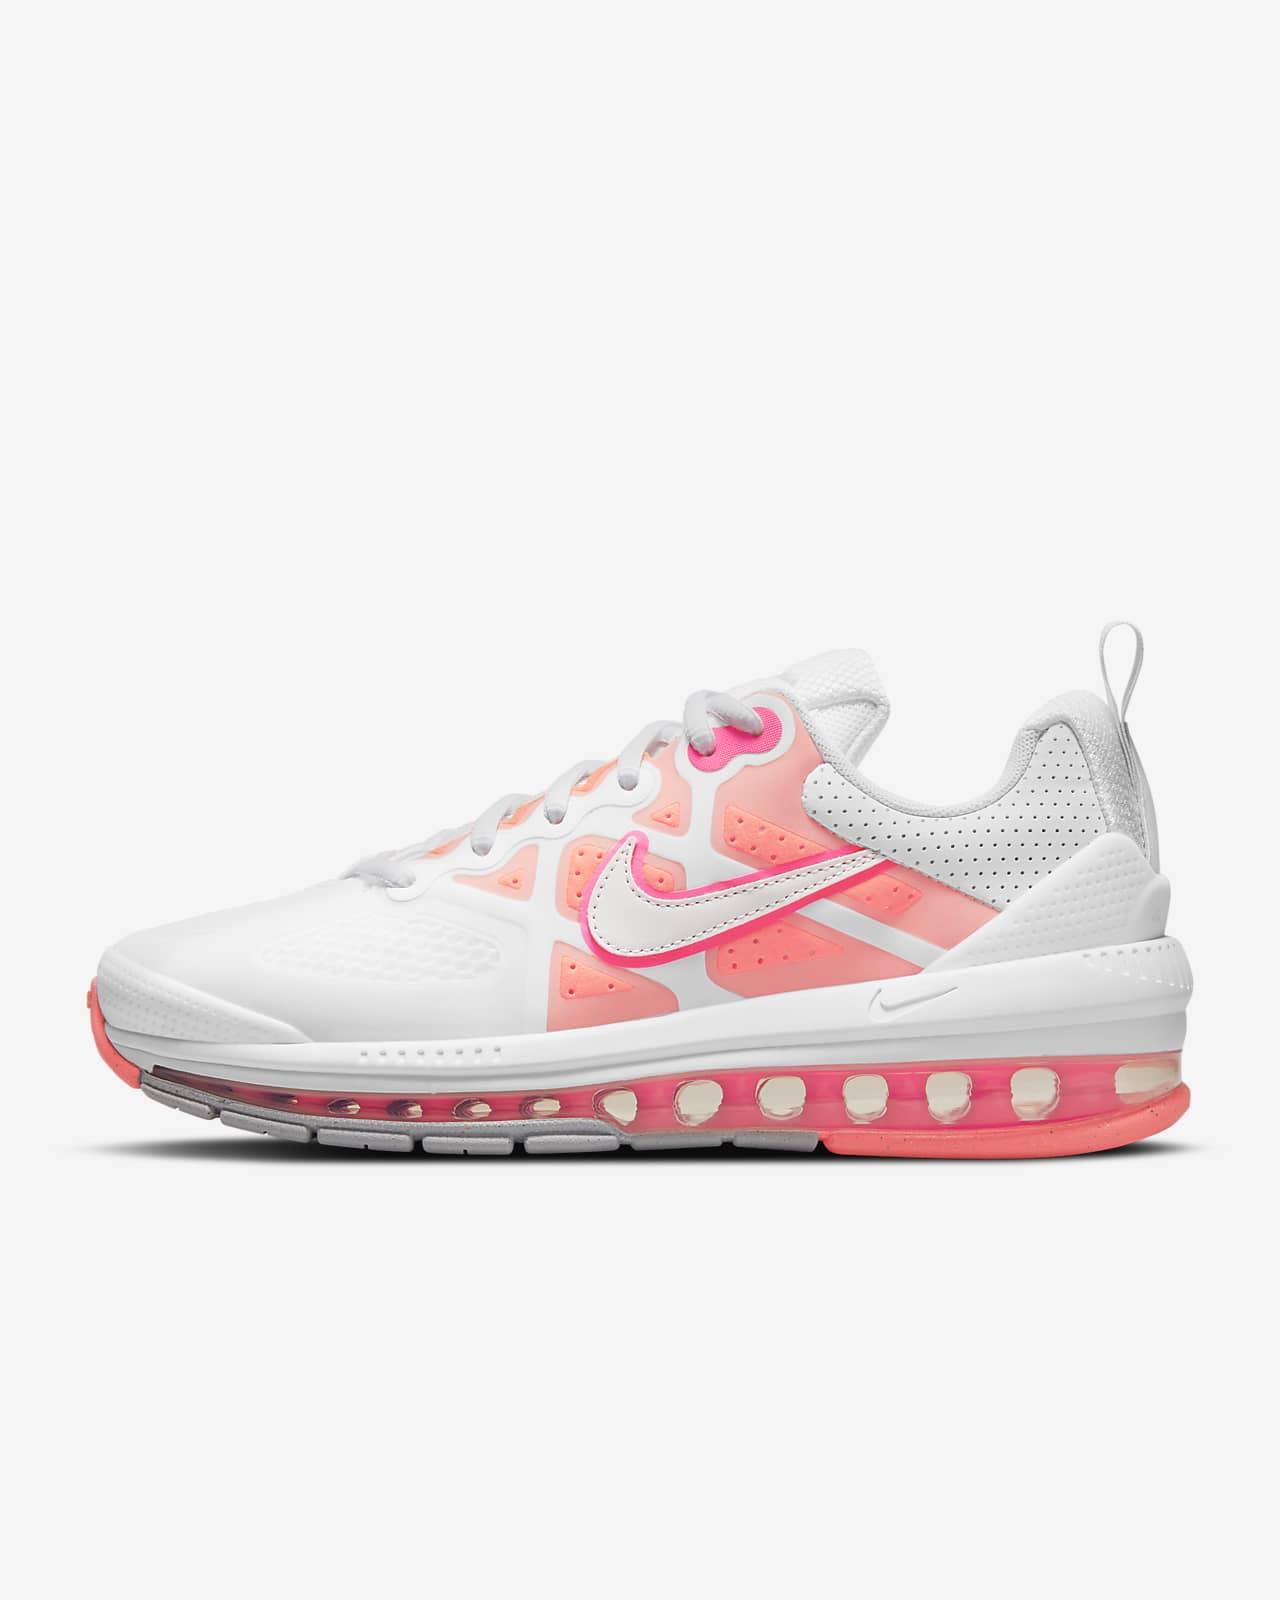 Nike Air Max Genome Women's Shoe